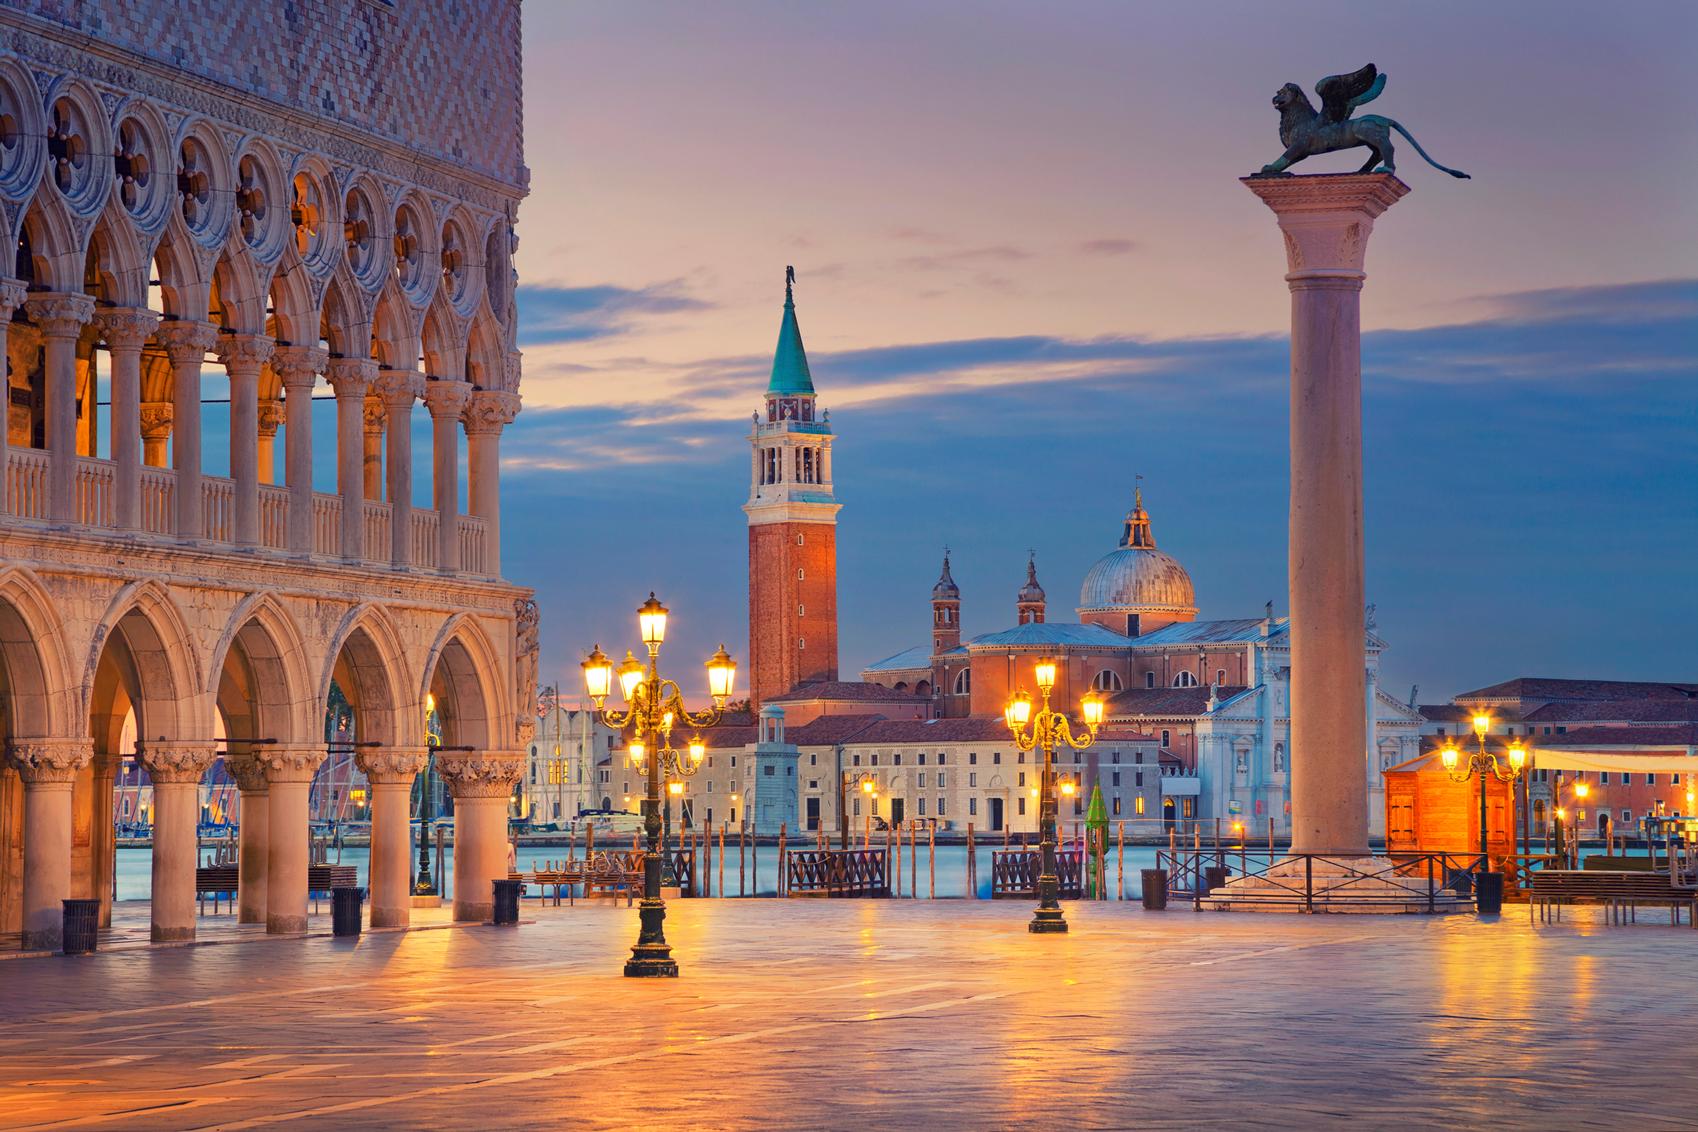 Sights in Italy Venice-www.istockphoto.com_gb_photo_venice-gm490387740-75171769-RudyBalasko